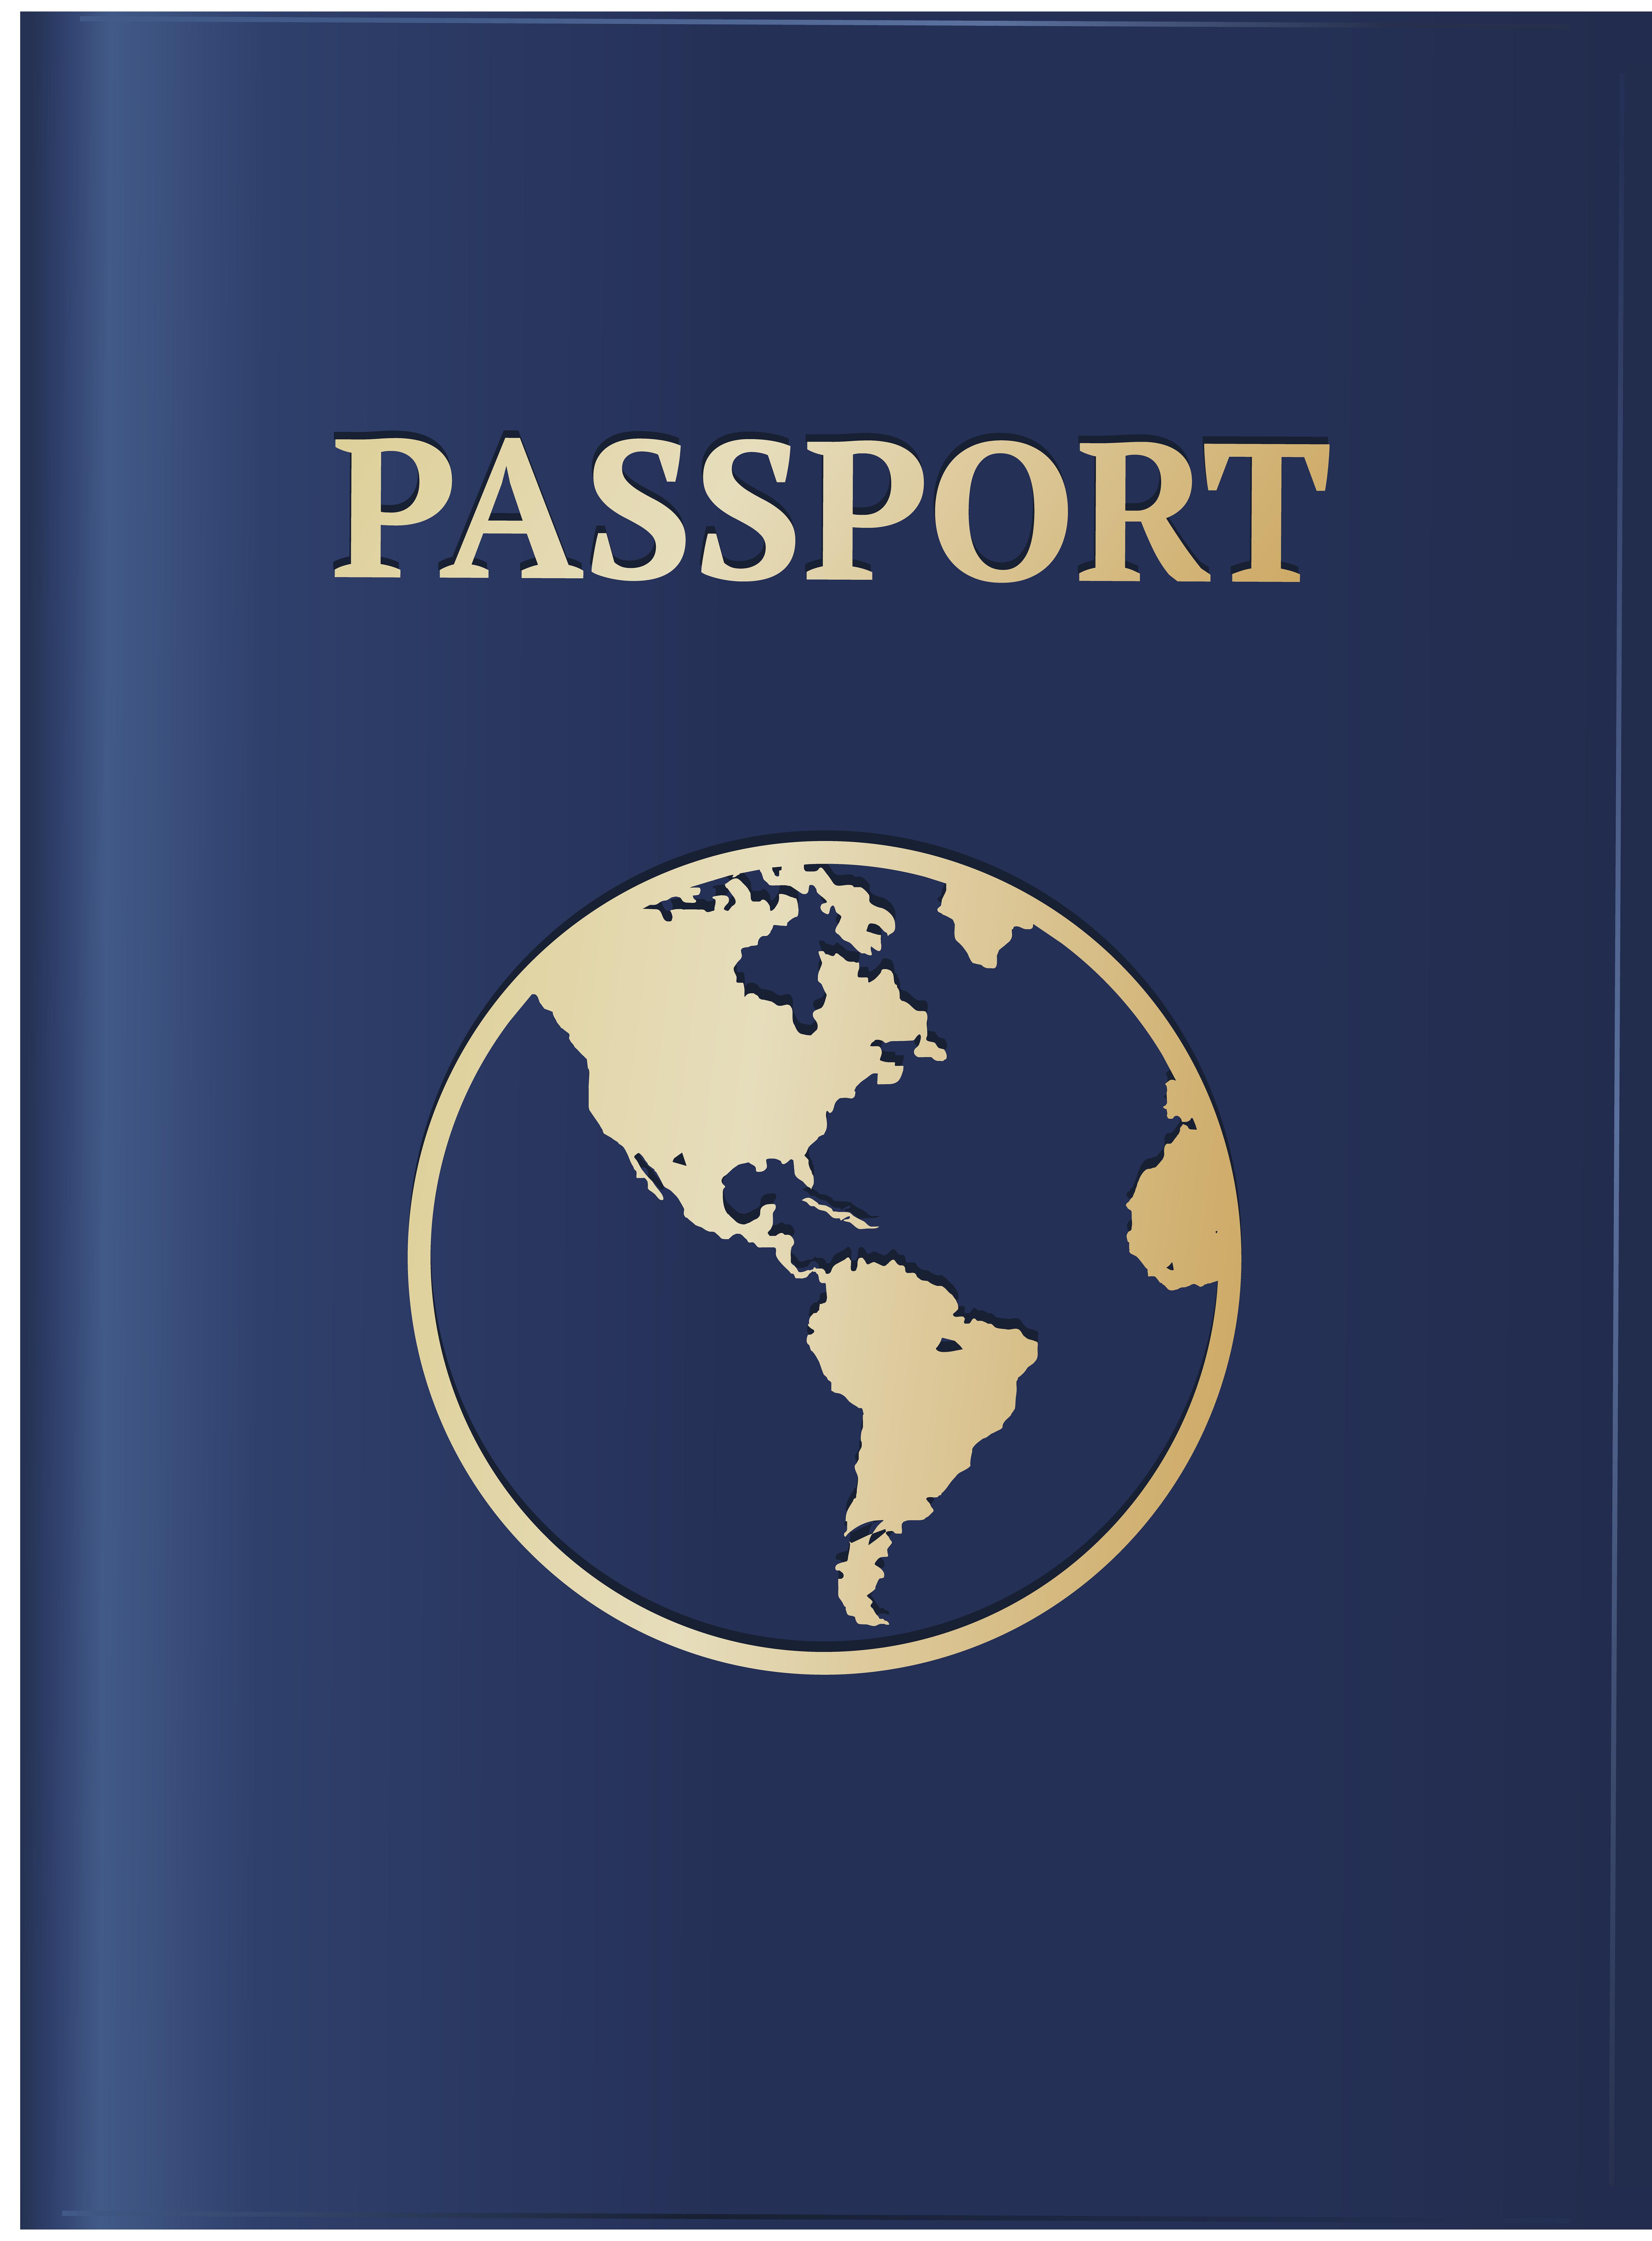 Blue png image gallery. Passport clipart transparent background passport